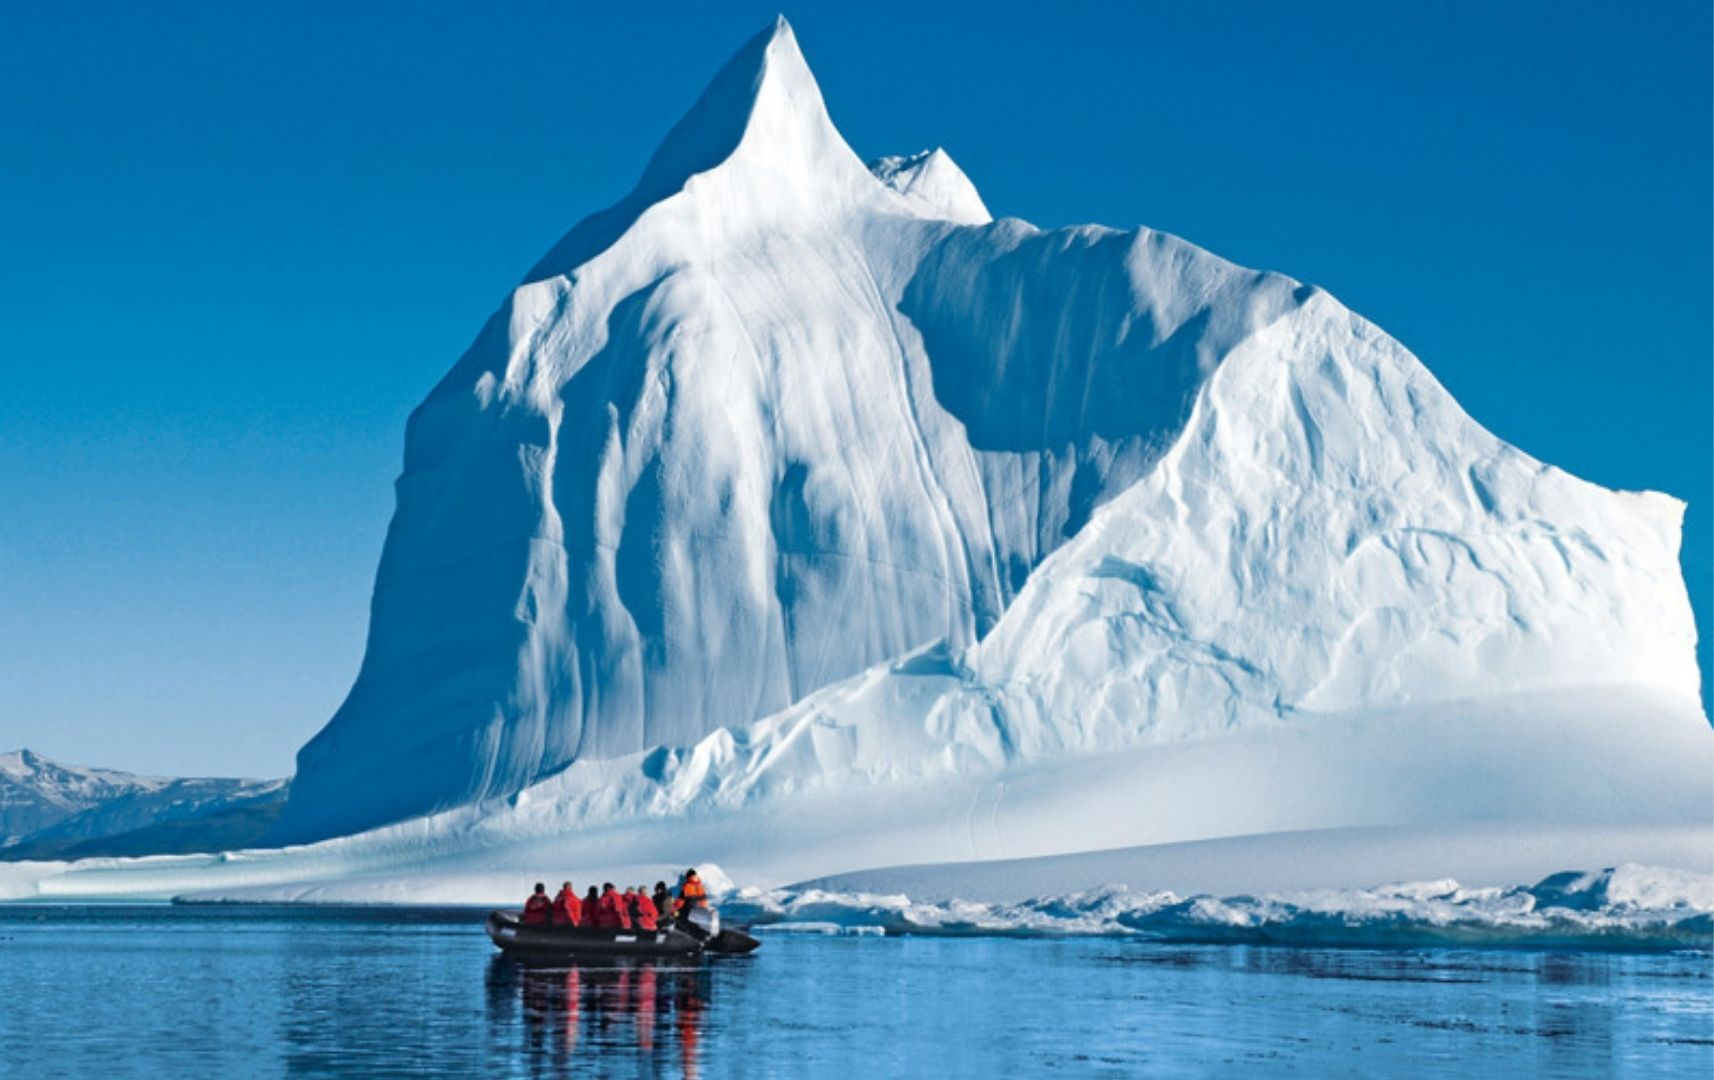 Antarktis Ausflug Eisberg Reiseart Reisebericht